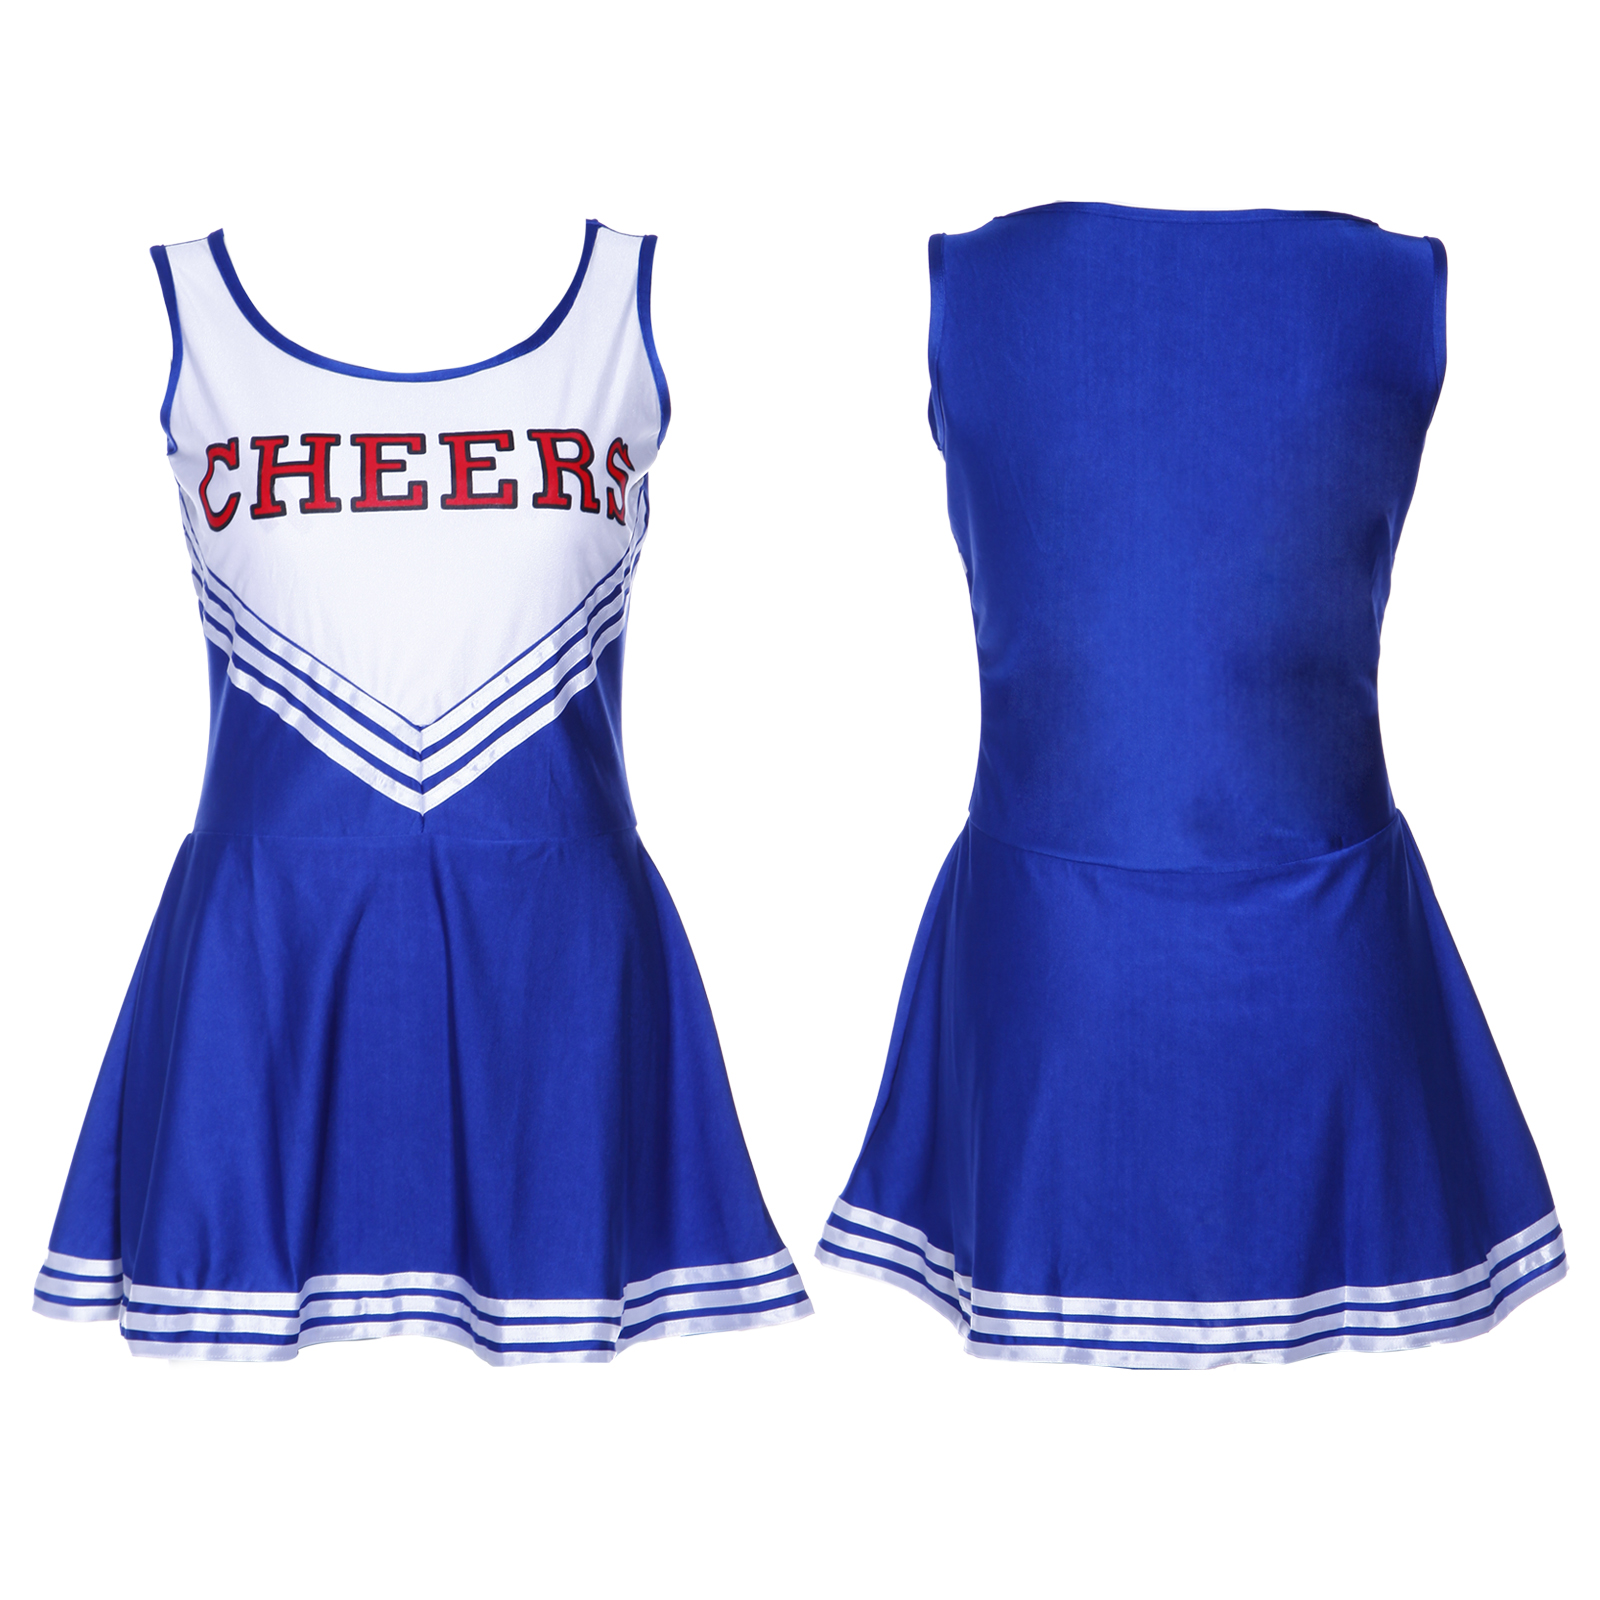 HIGH SCHOOL SPORTS TEAM CHEER GIRL UNIFORM Cheerleader COSTUME OUTFIT W/POM POMS | EBay